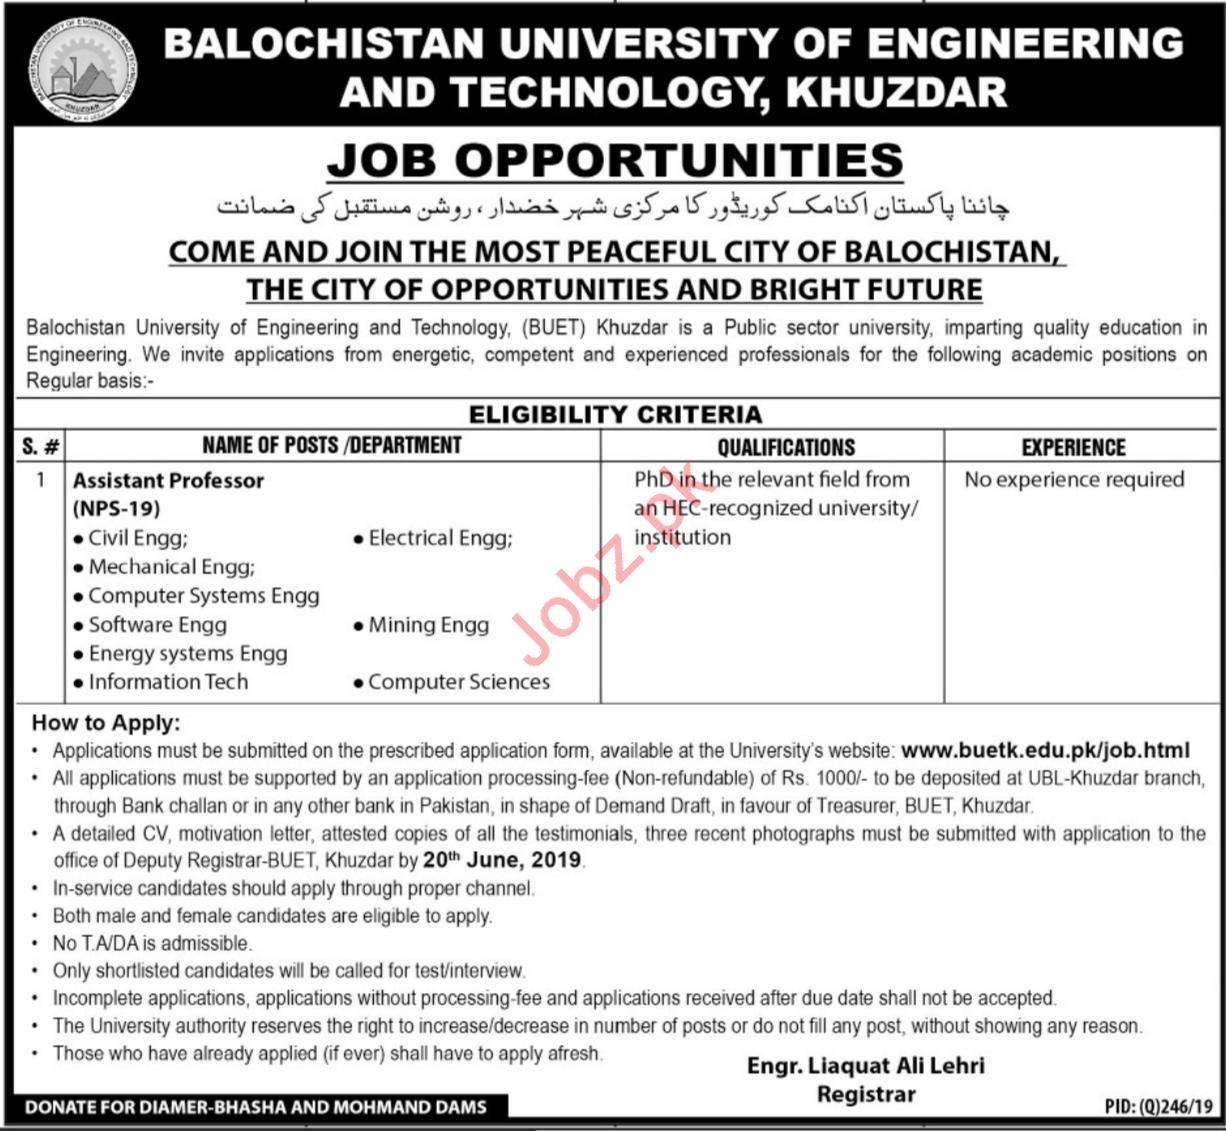 Balochistan University of Engineering and Technology Jobs